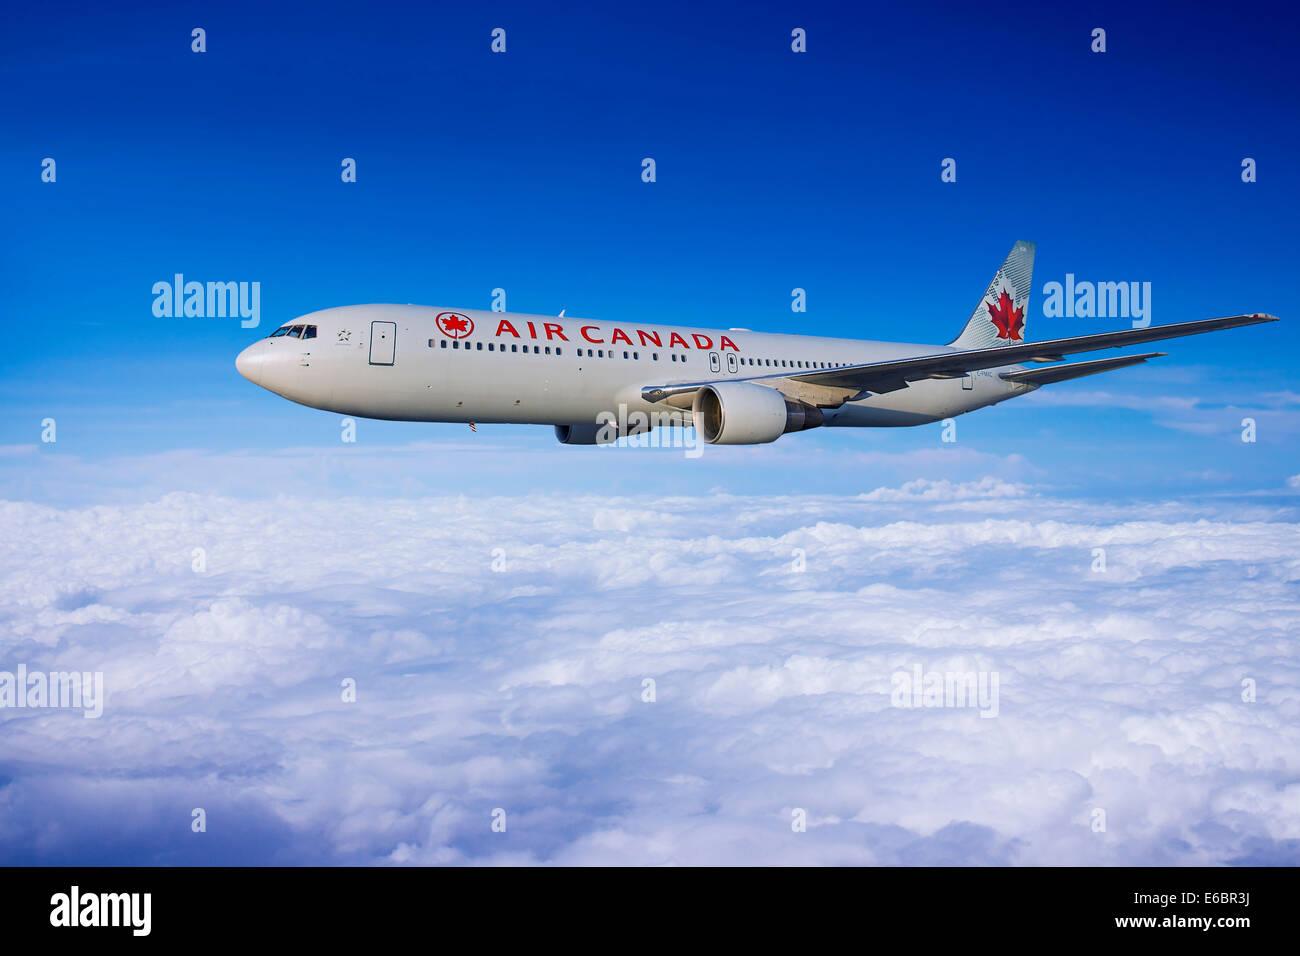 Air Canada Boeing 767-333 ER in flight Stock Photo